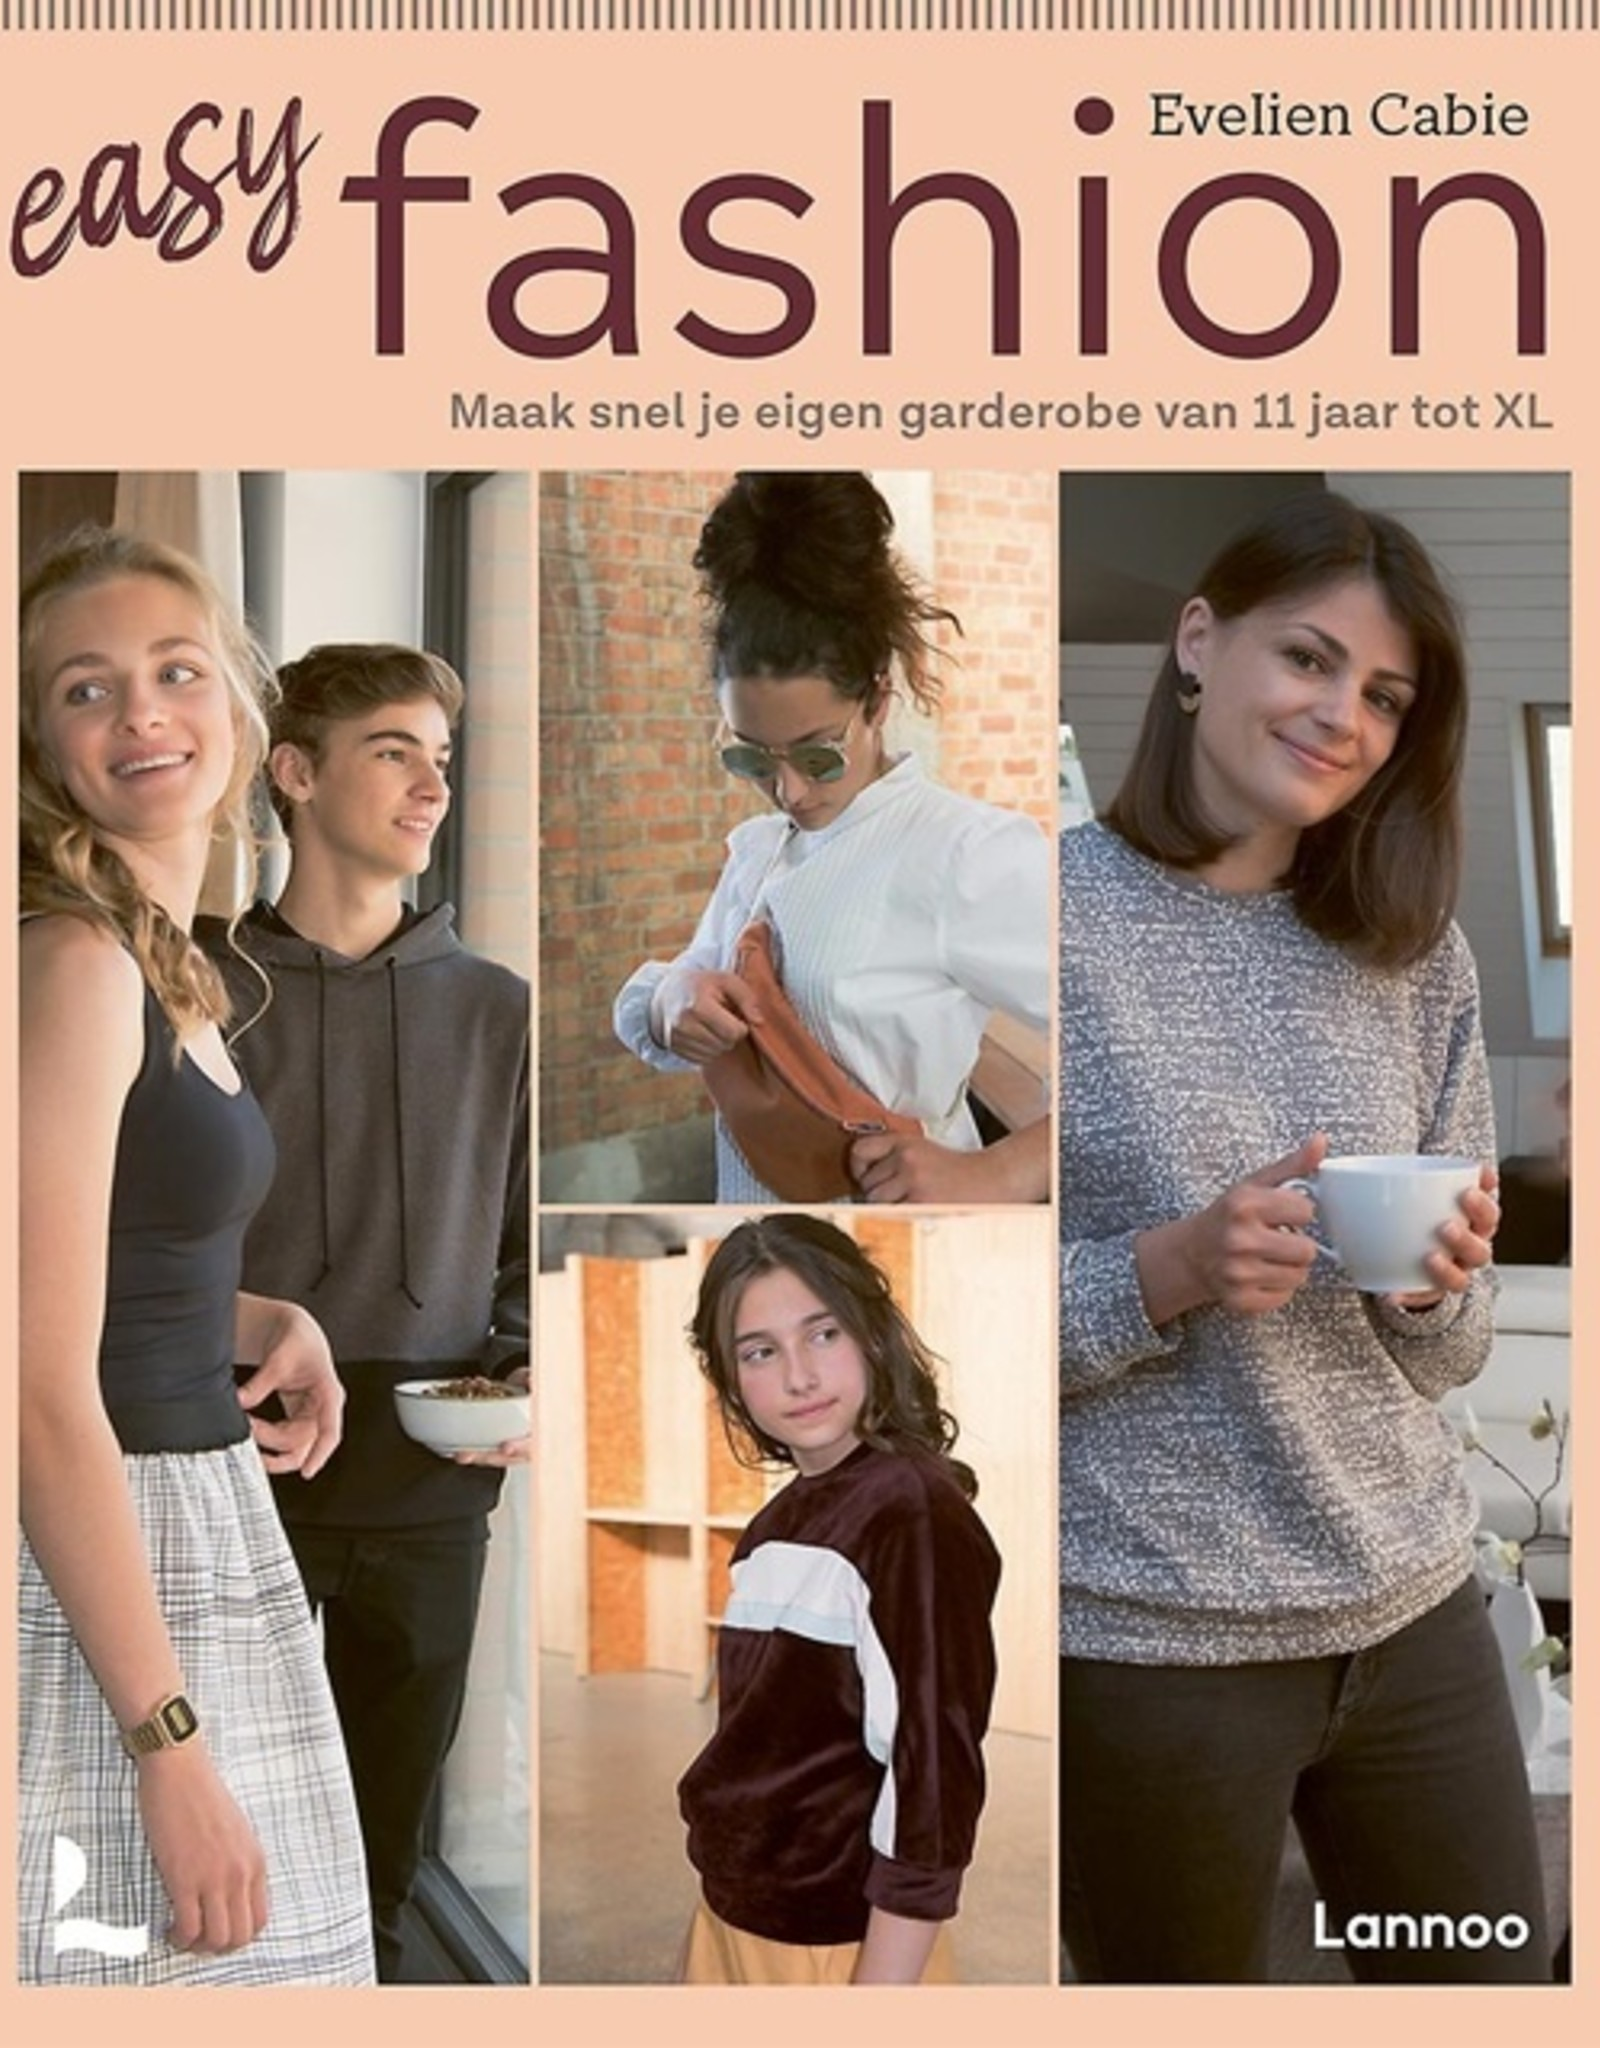 Naaiboek - Easy Fashion